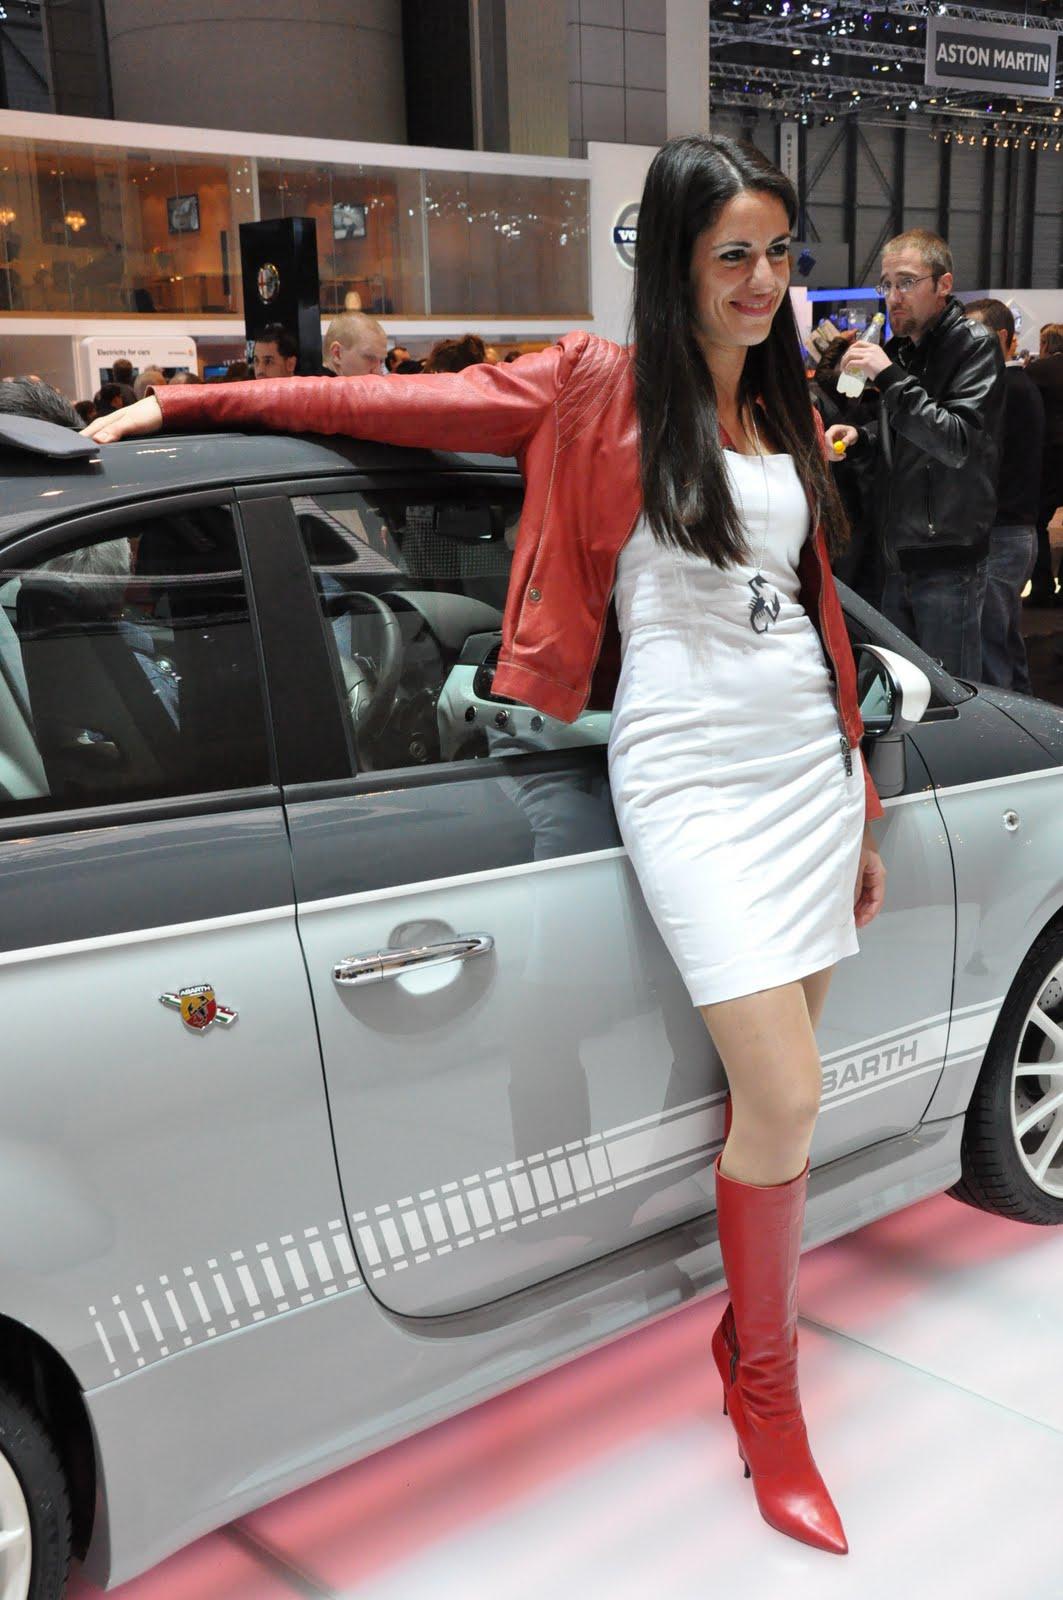 AUTOSHOWPICTURES: FIAT ABARTH GIRL